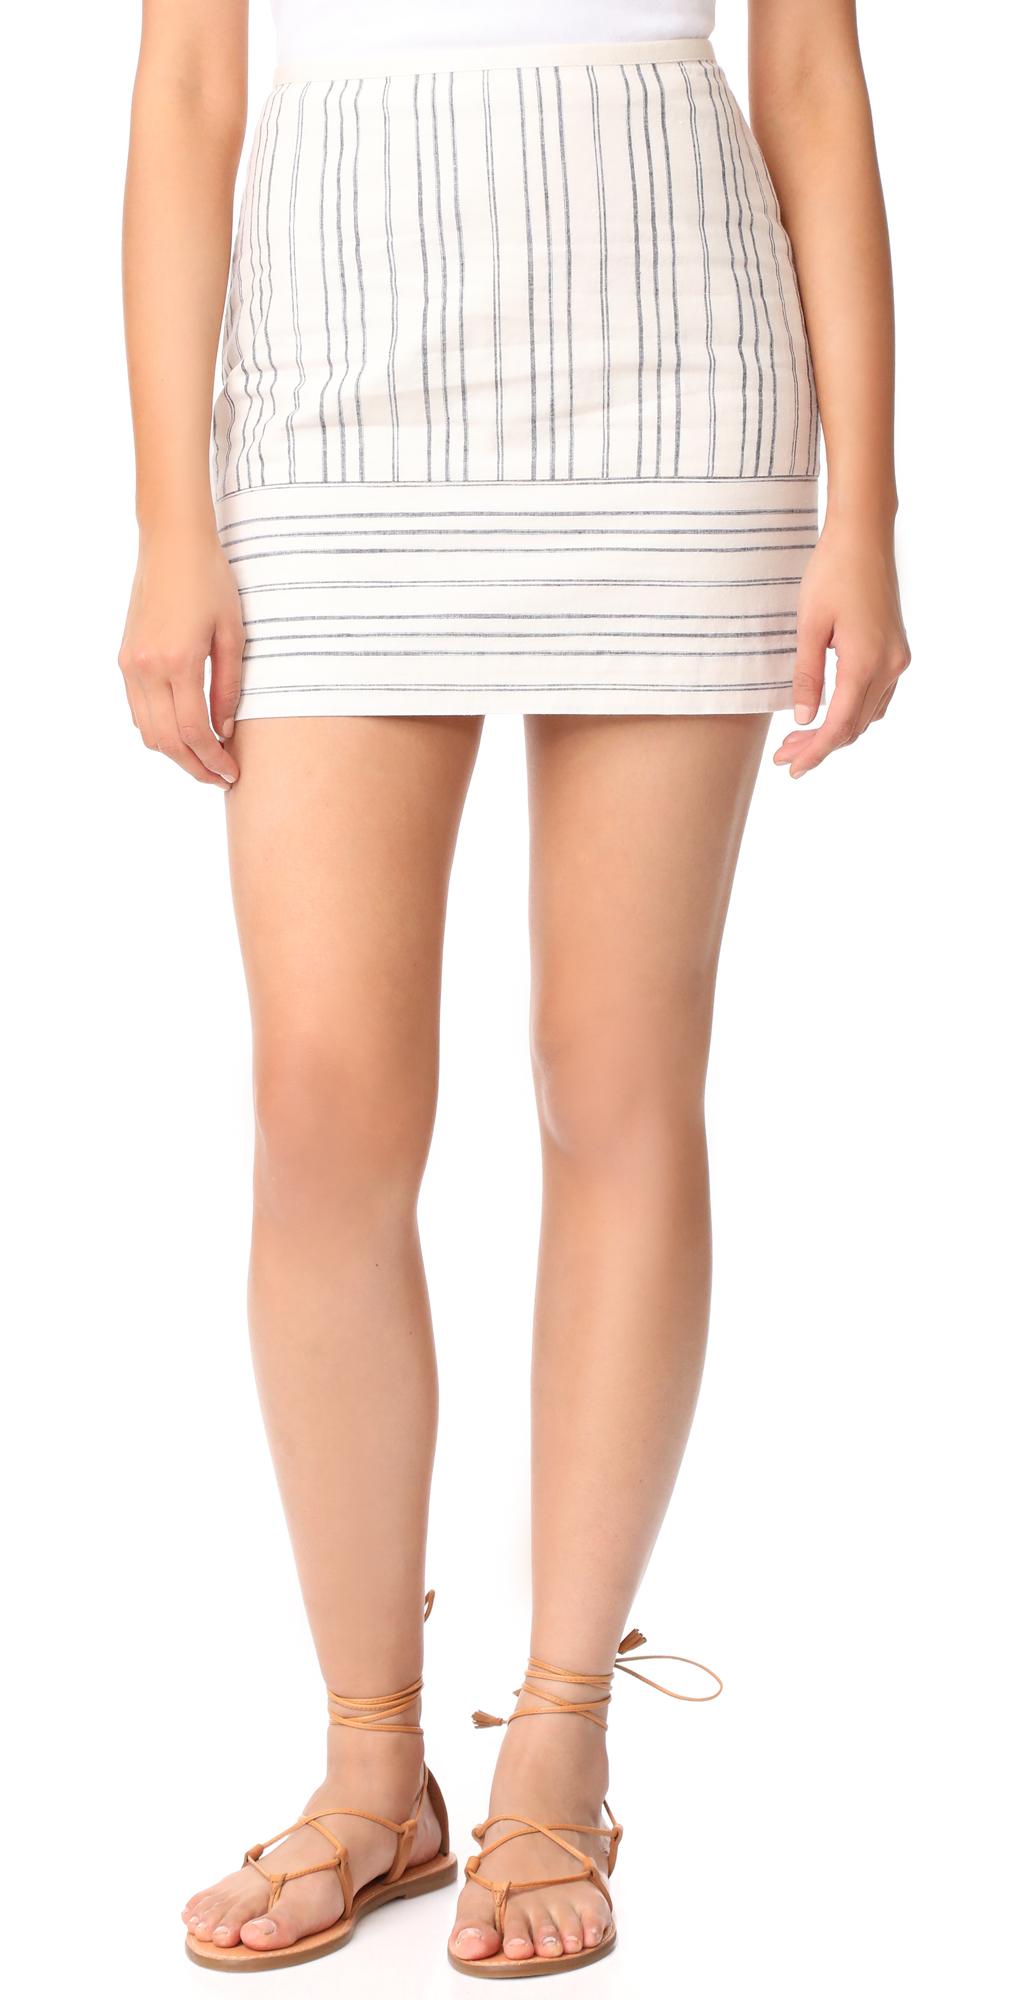 Gamine Miniskirt in Stripe Play Madewell